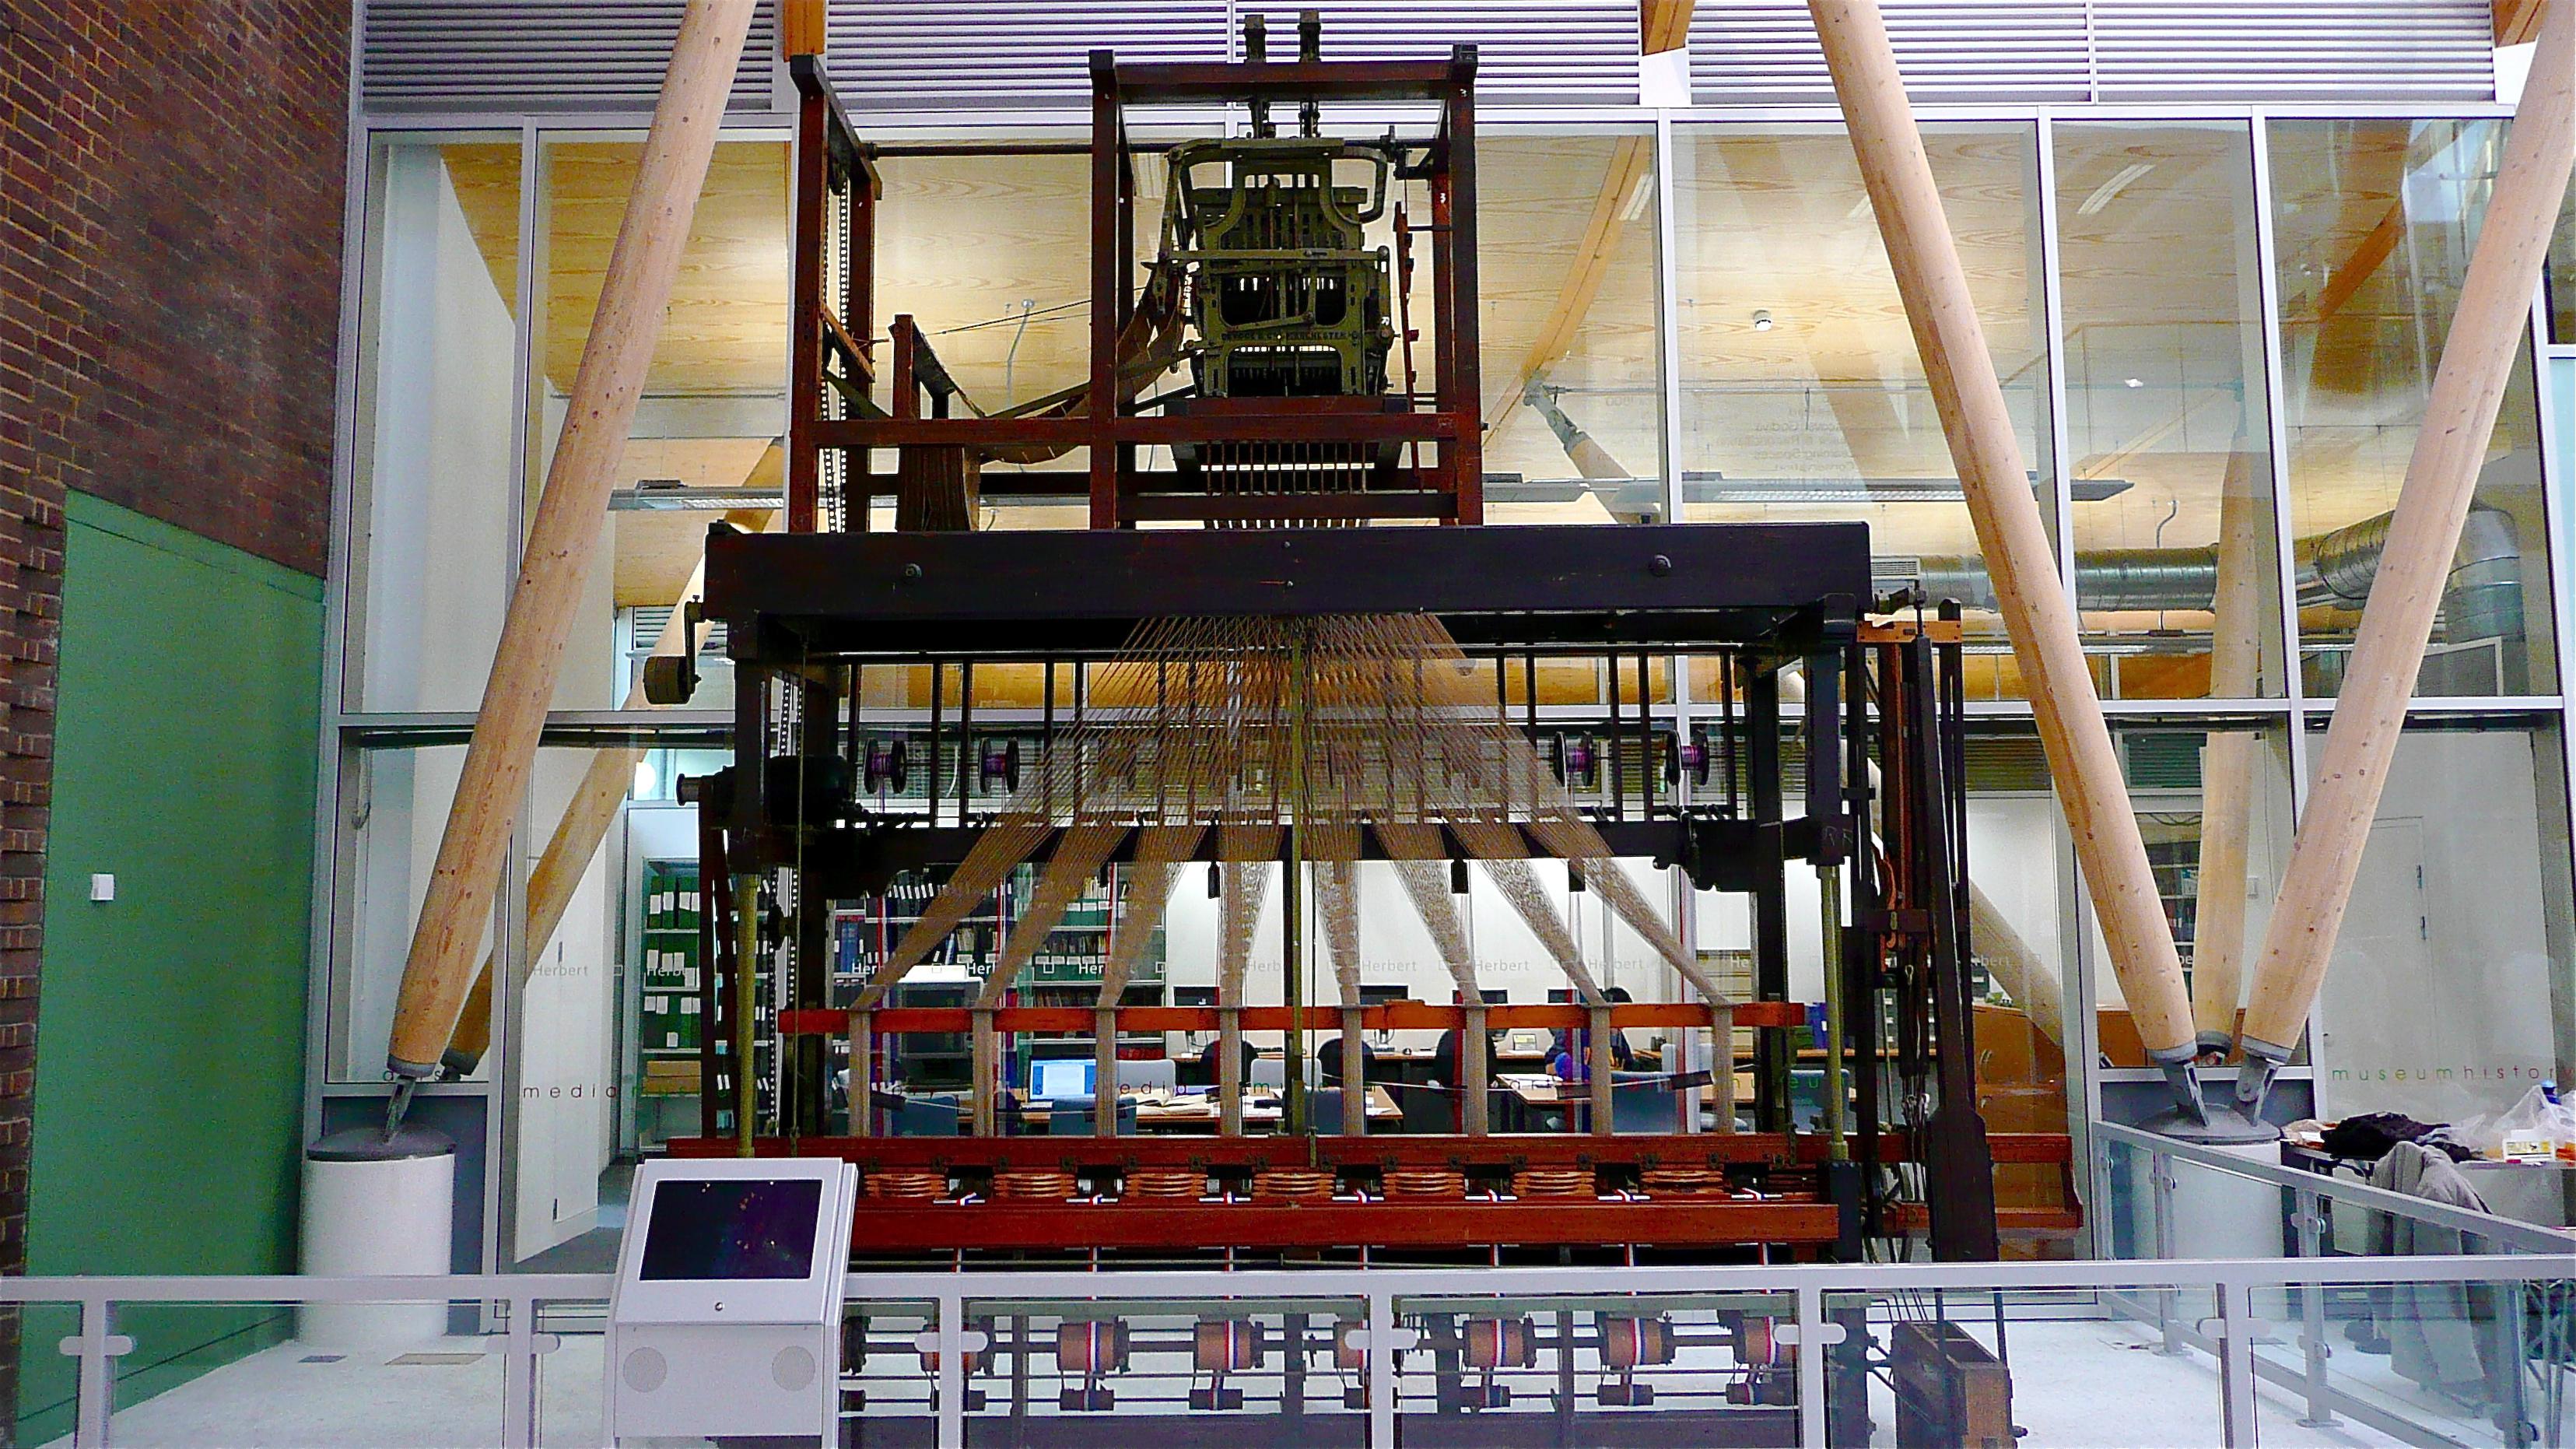 File:Herbert Art Museum and Gallery, Coventry - Jacquard loom.jpg